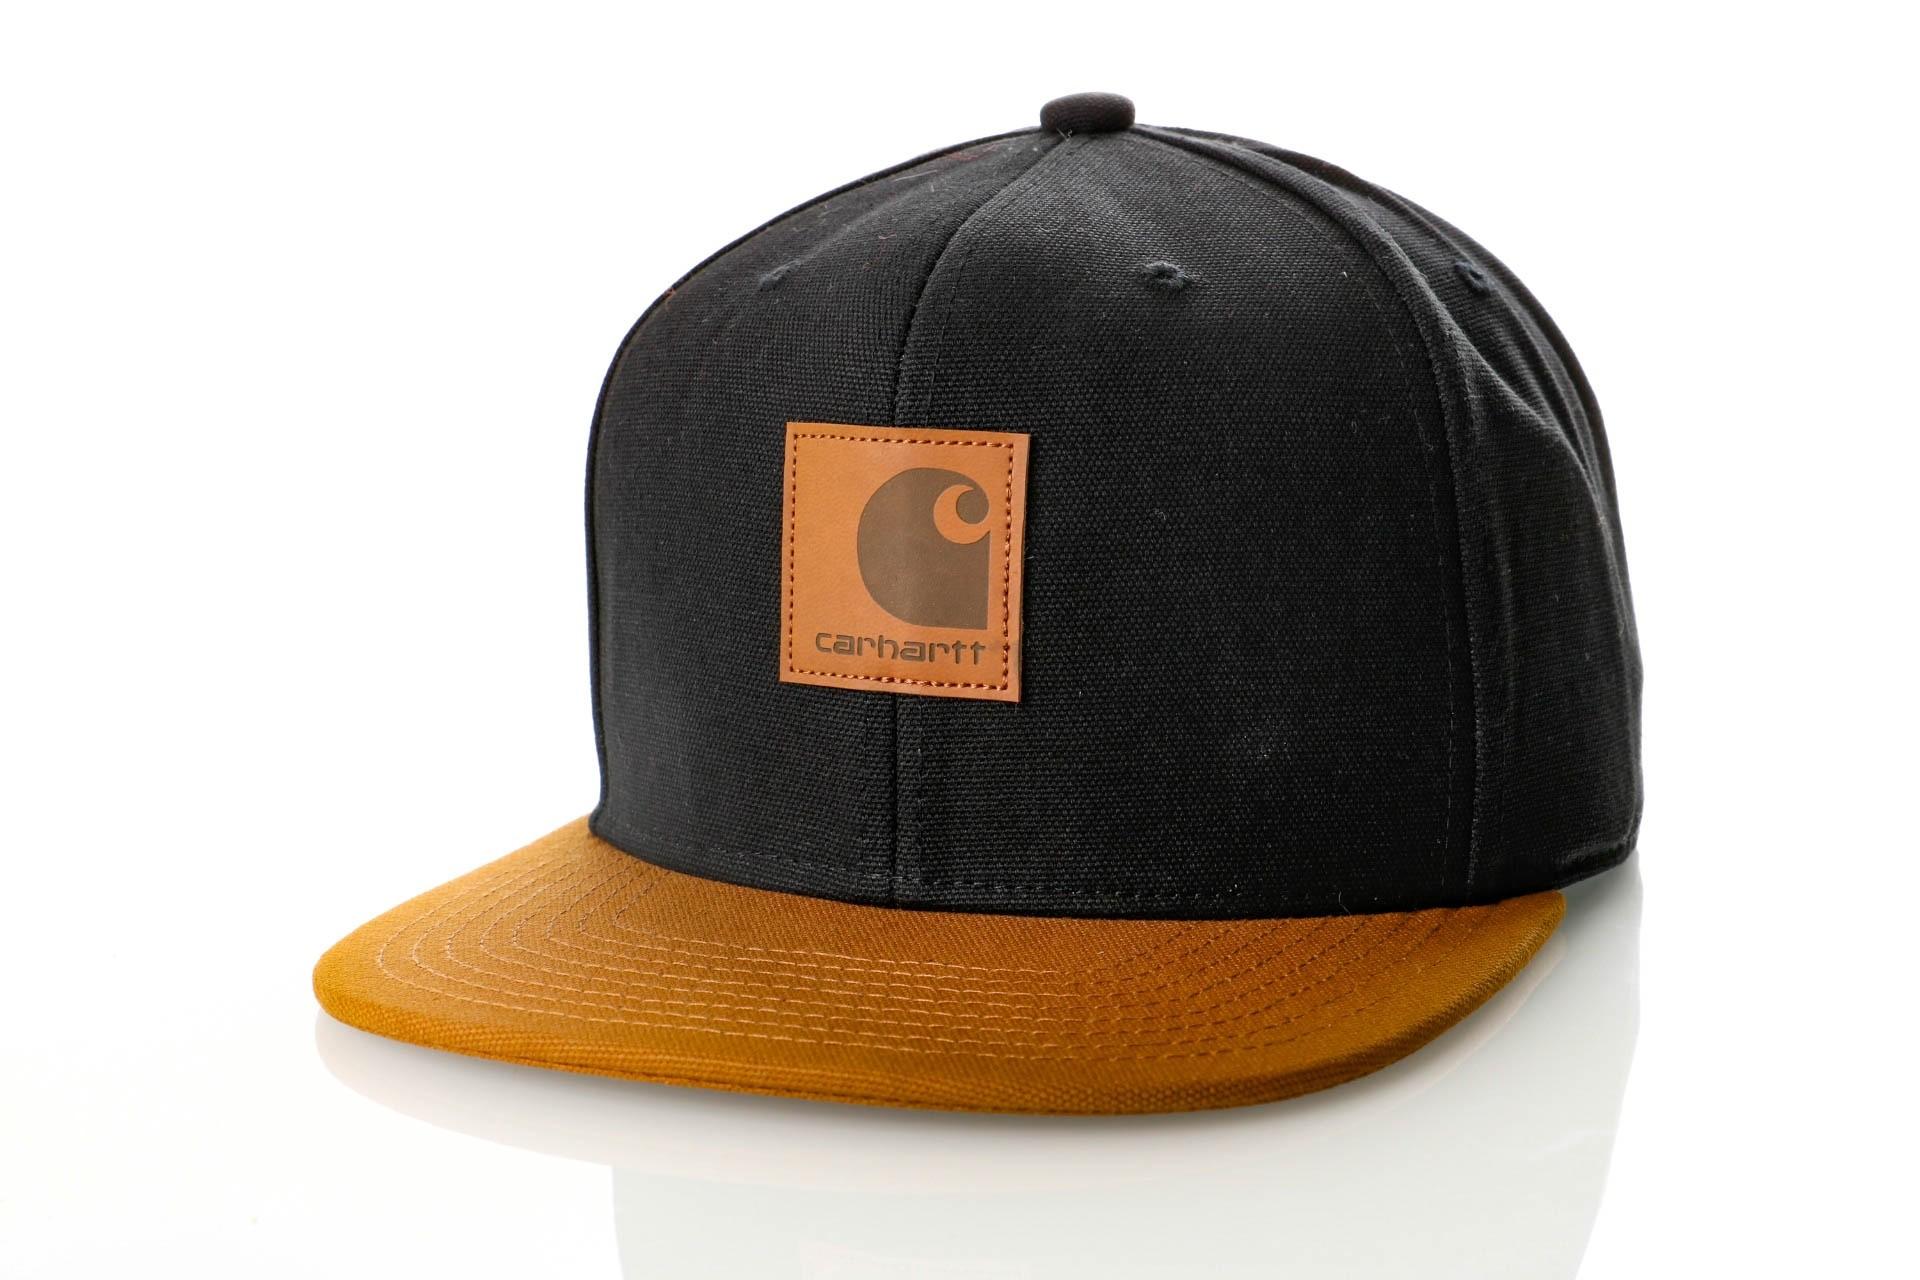 Afbeelding van Carhartt WIP Logo Cap Bi-Colored I025735 Snapback cap Black / Hamilton Brown